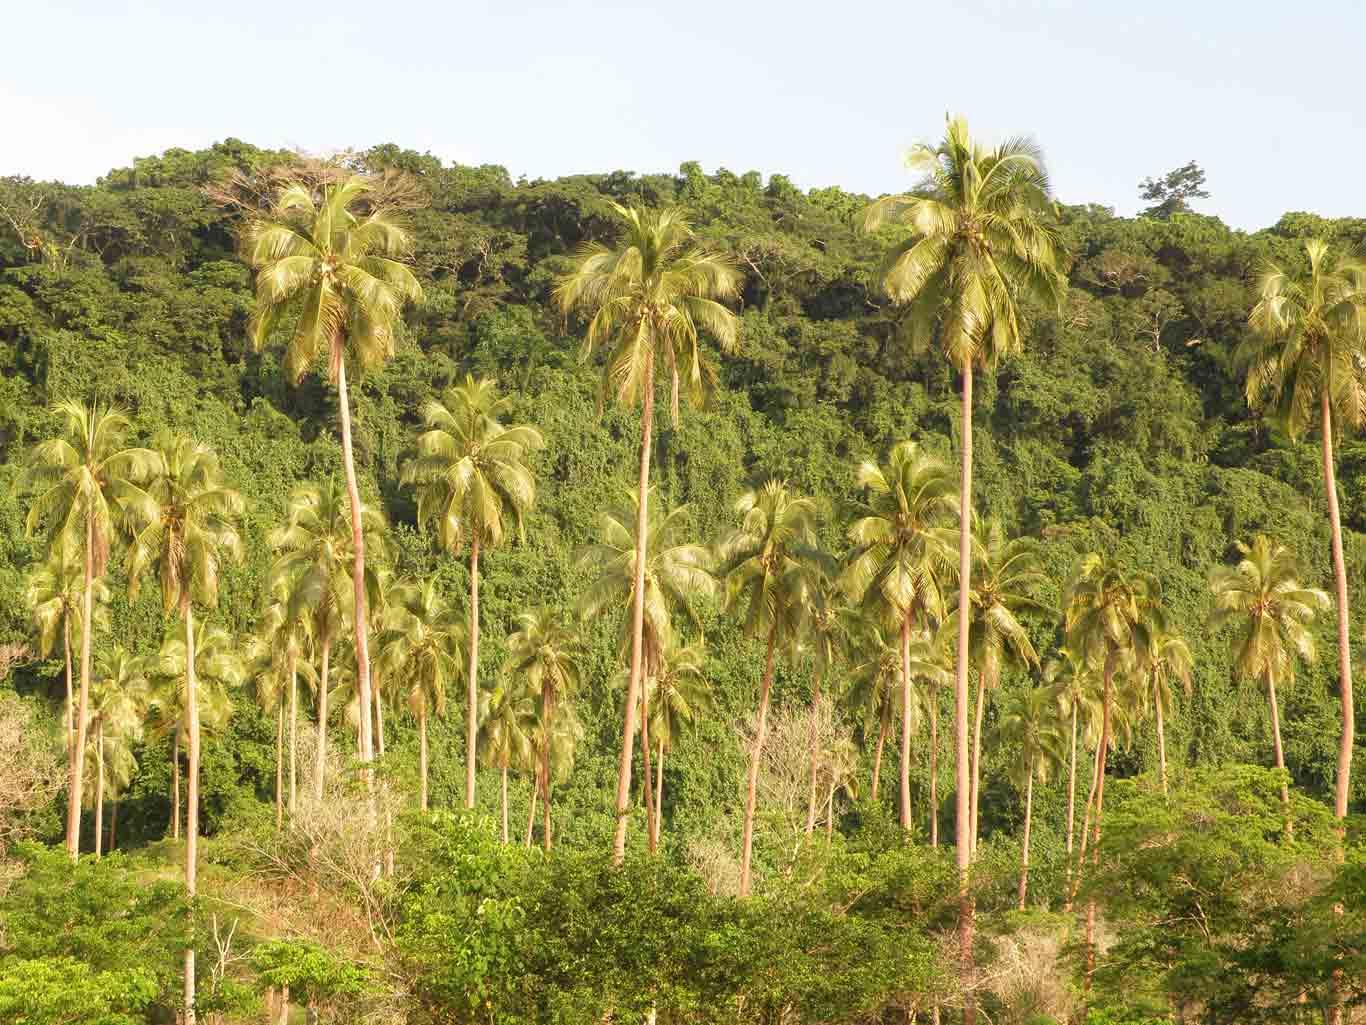 Coconuts in Espiritu Santo, Vanuatu.